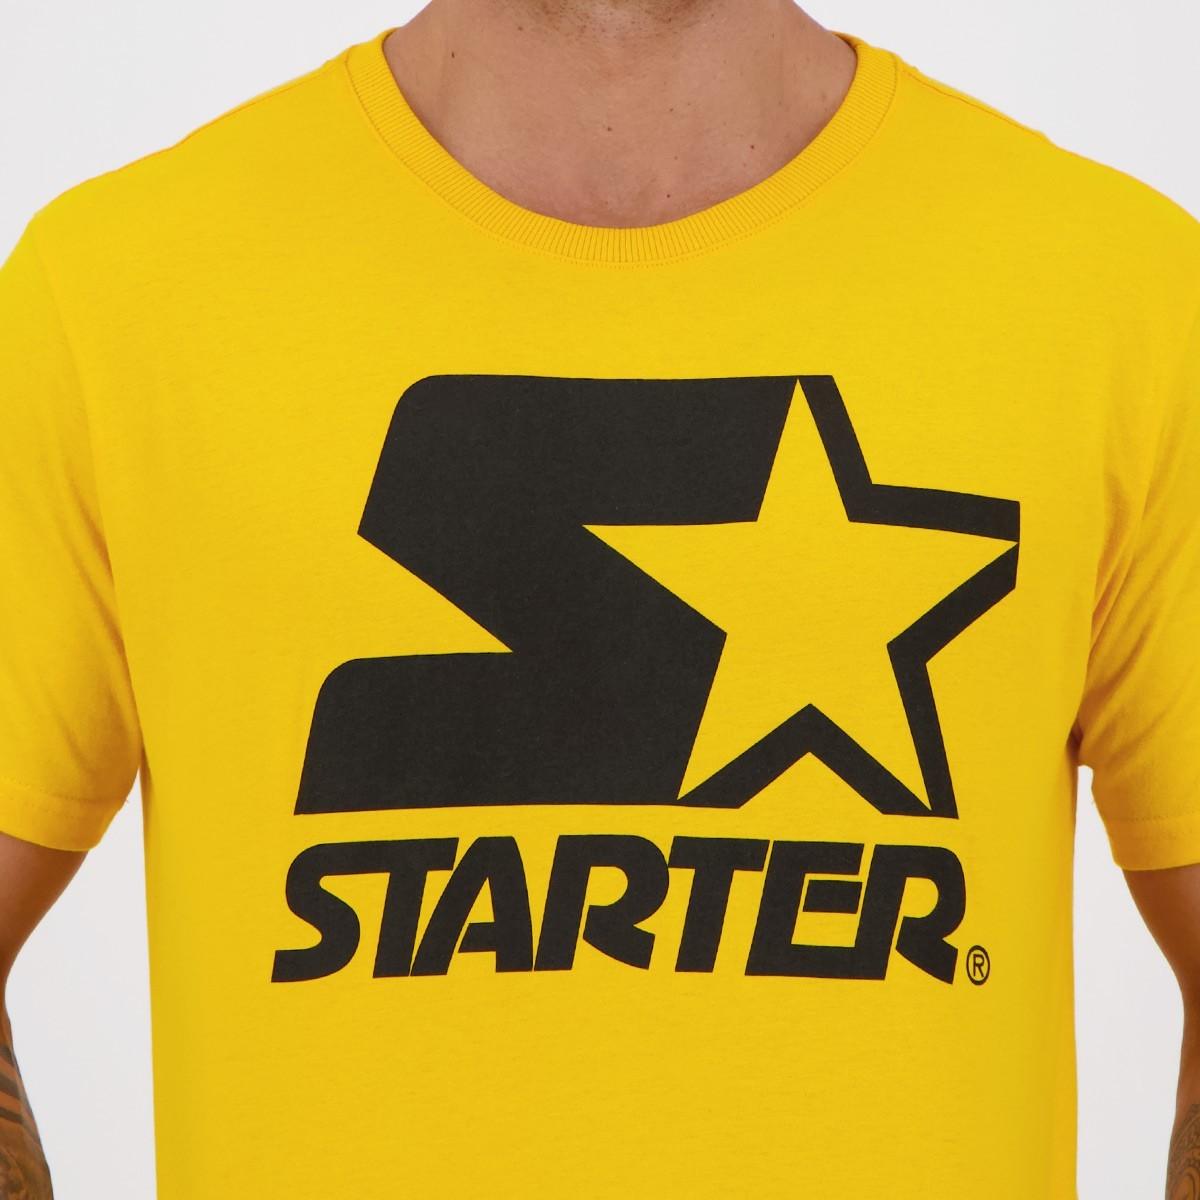 CAMISETA STARTER T199A - AMA